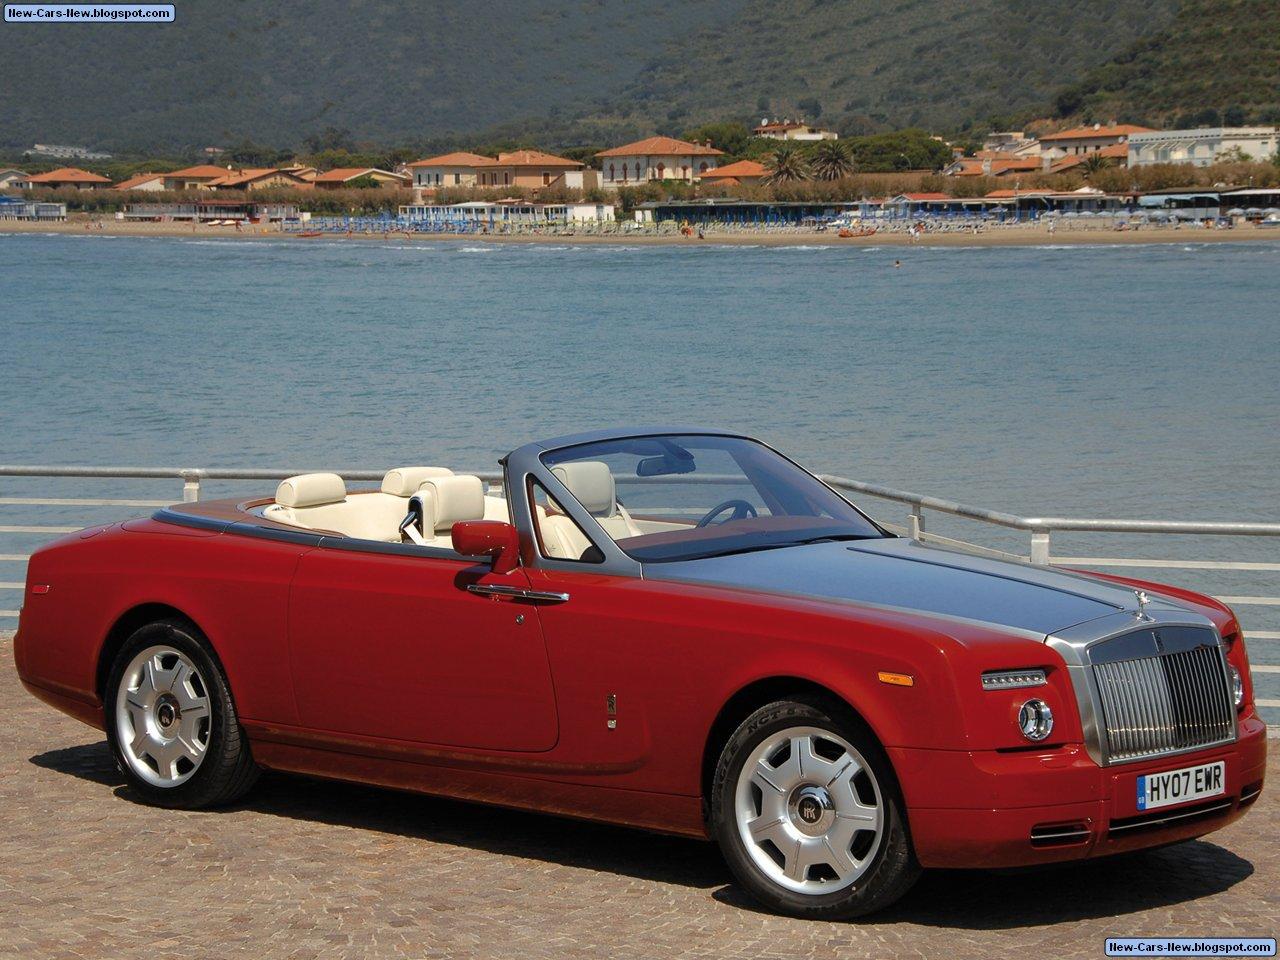 Rolls Royce Phantom Drophead Coupe 2008 Best Car Blog